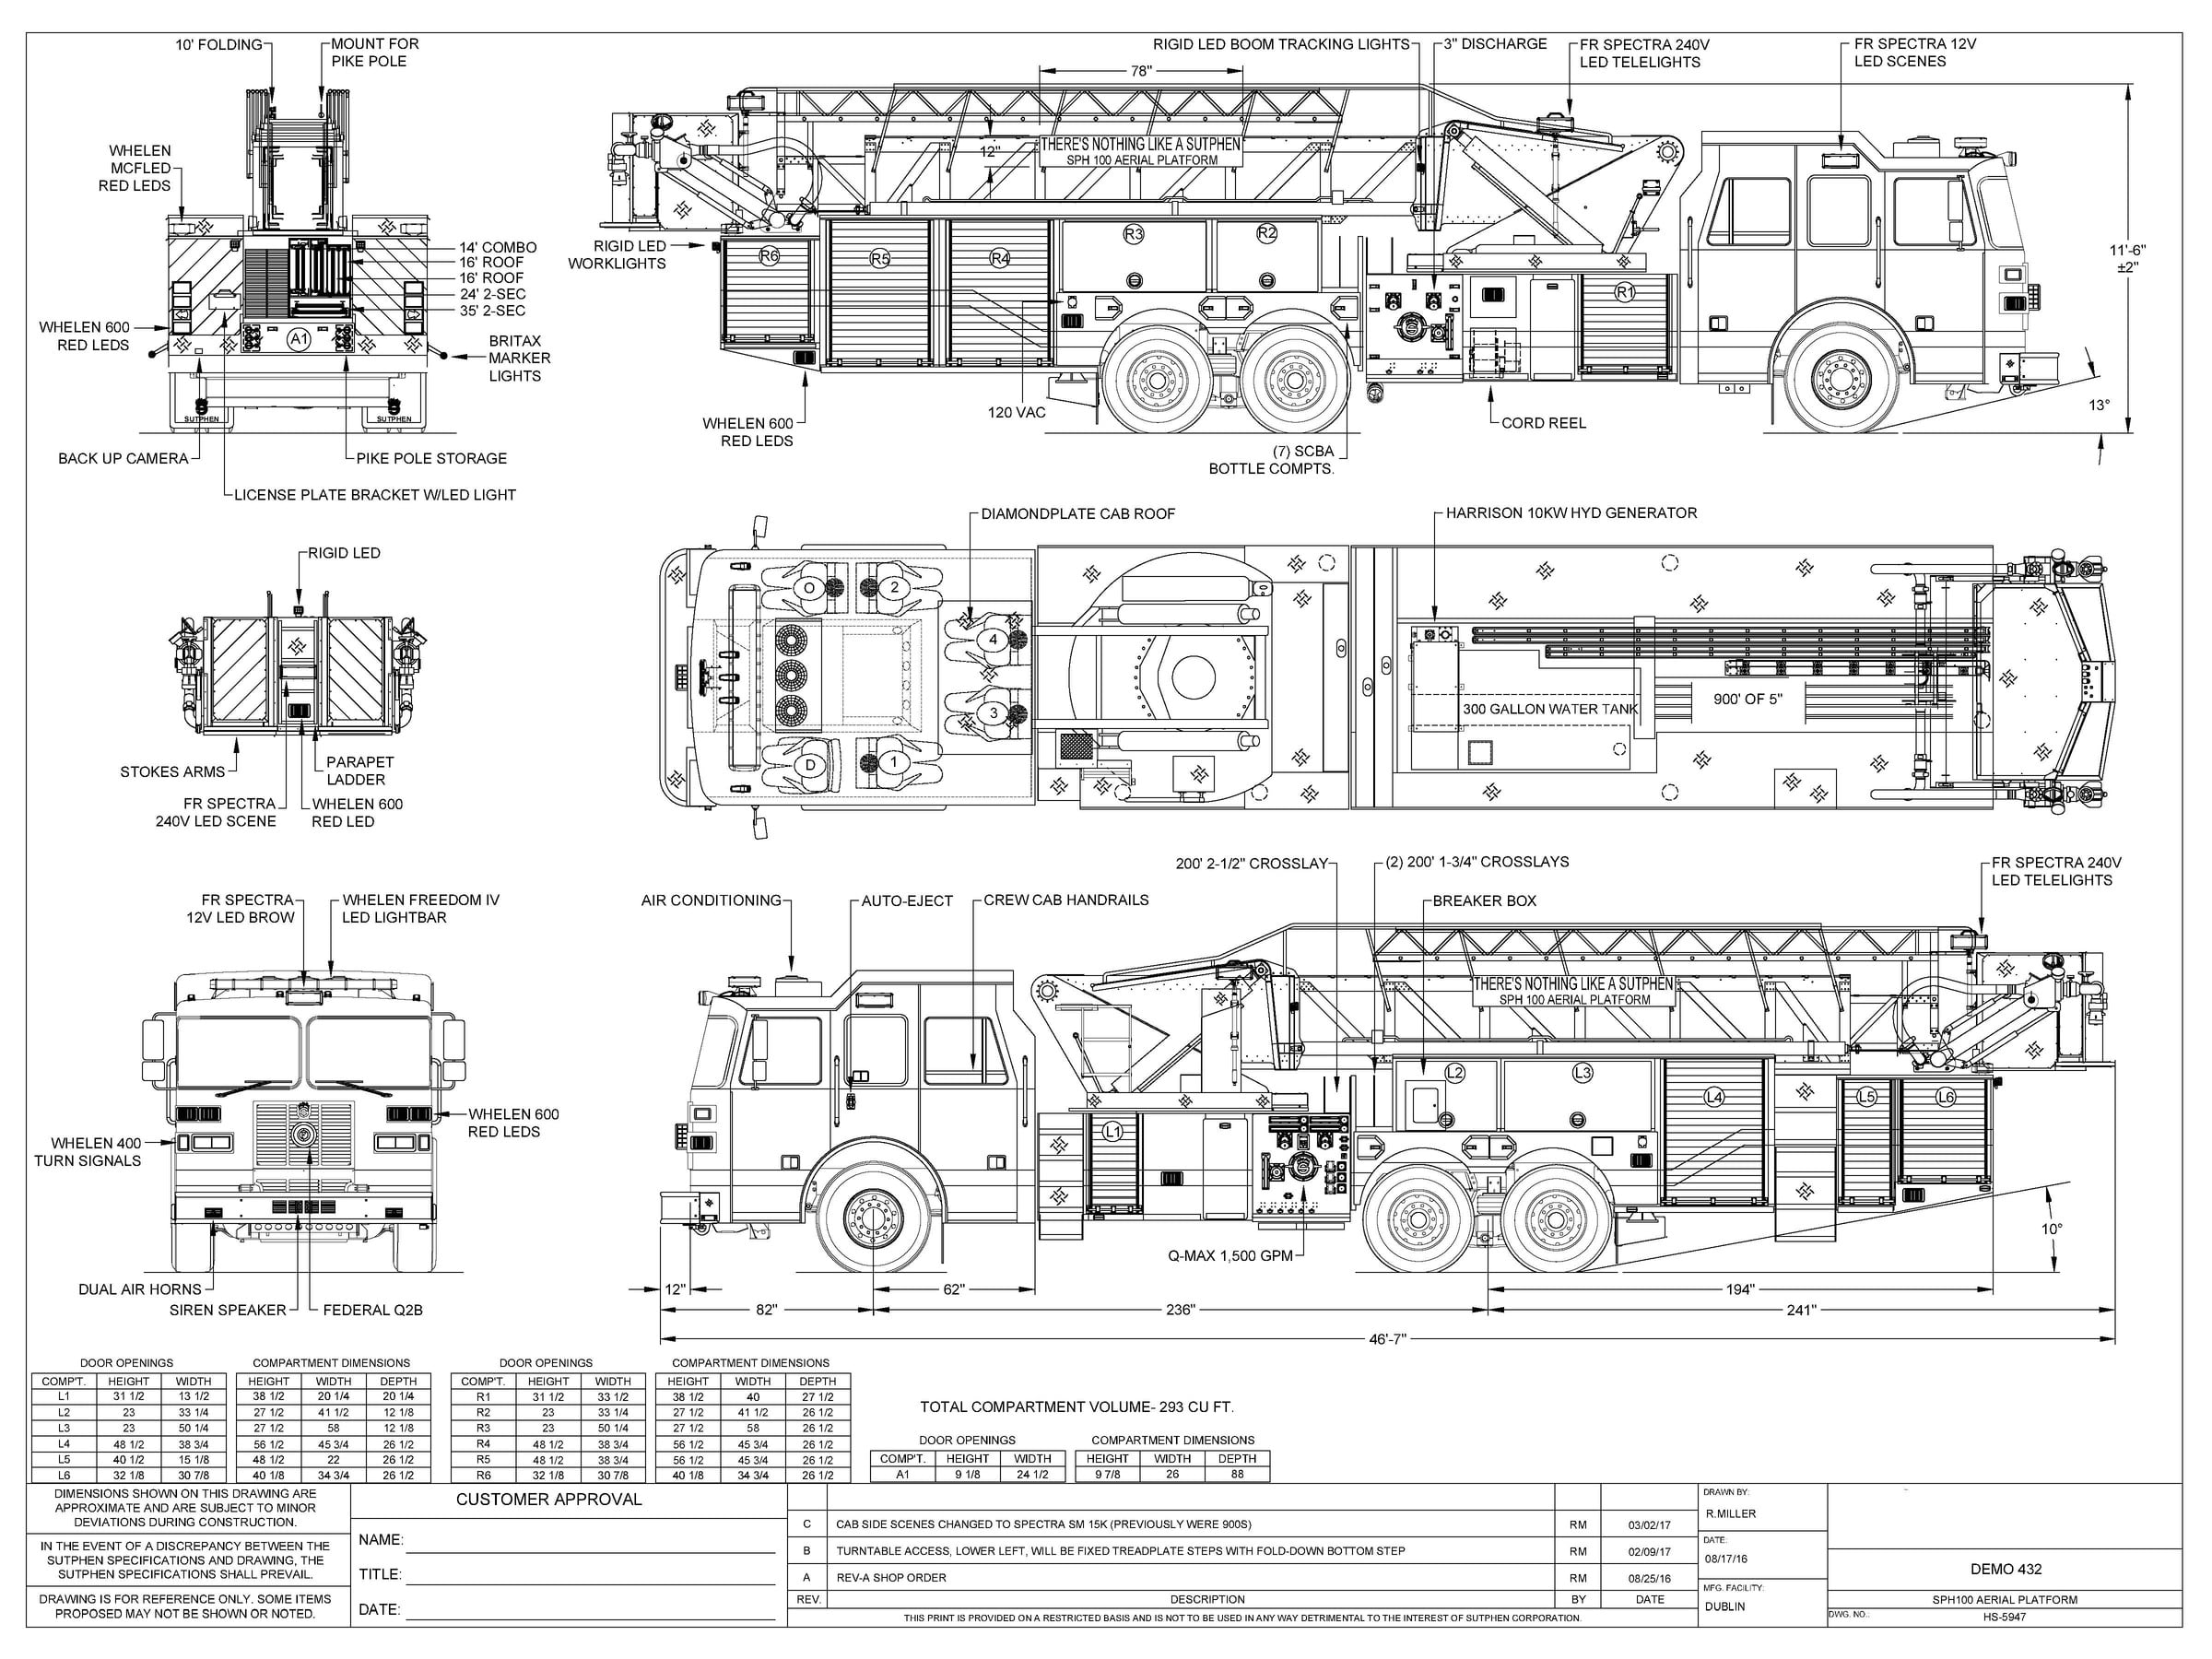 SPH 100 Aerial Platform, Demo 432